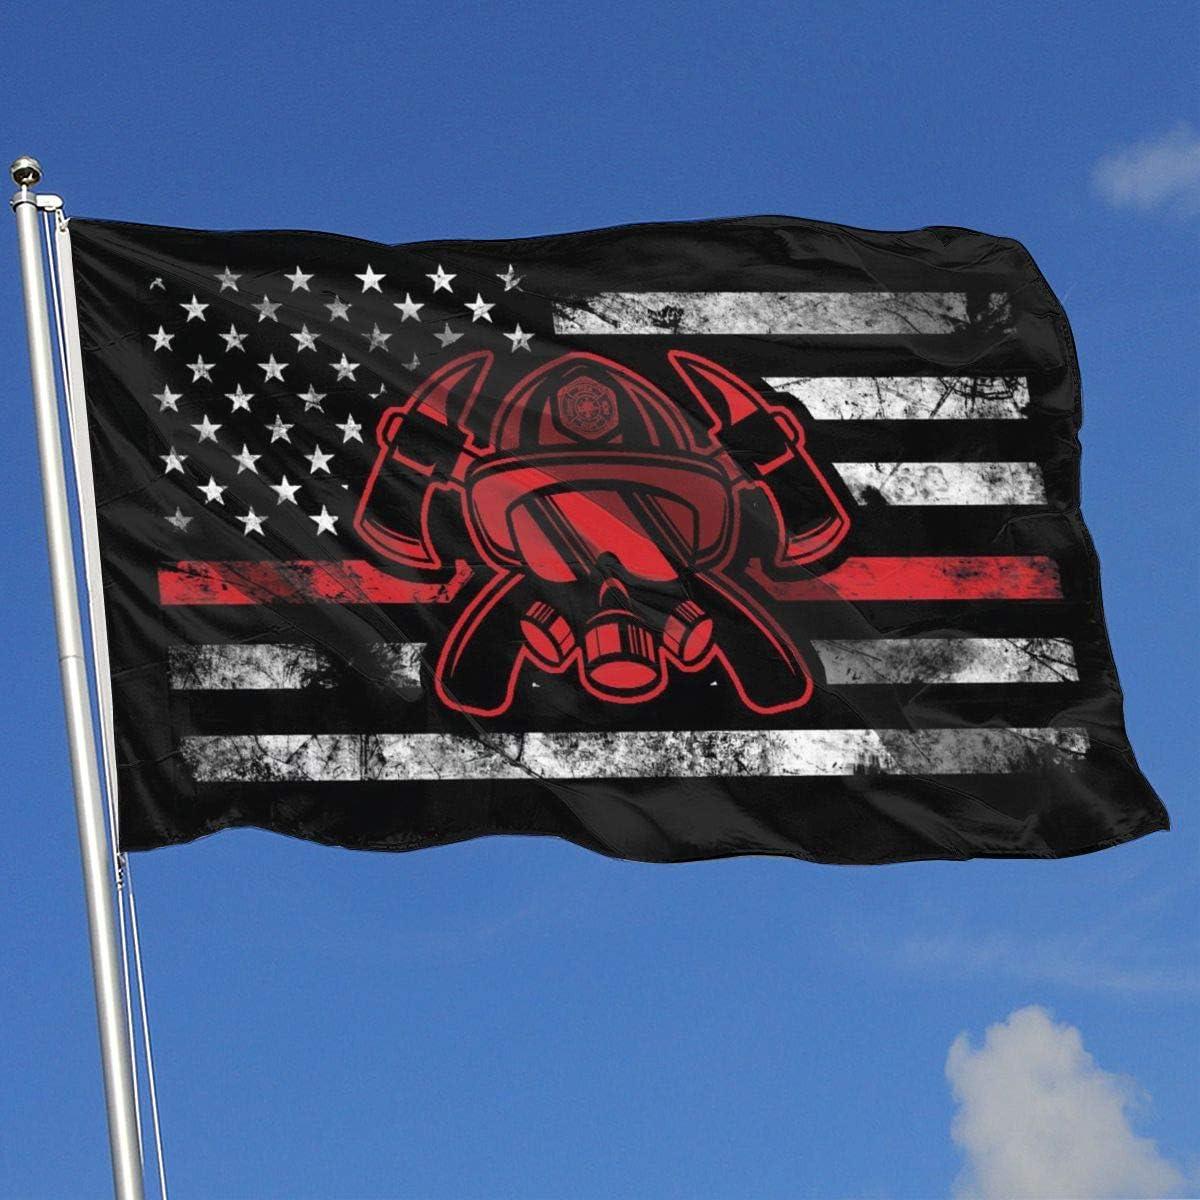 EROOU8W Thin Red Line Firefighter Home Decoration Garden Logo 3x5 Feet Canvas Flag